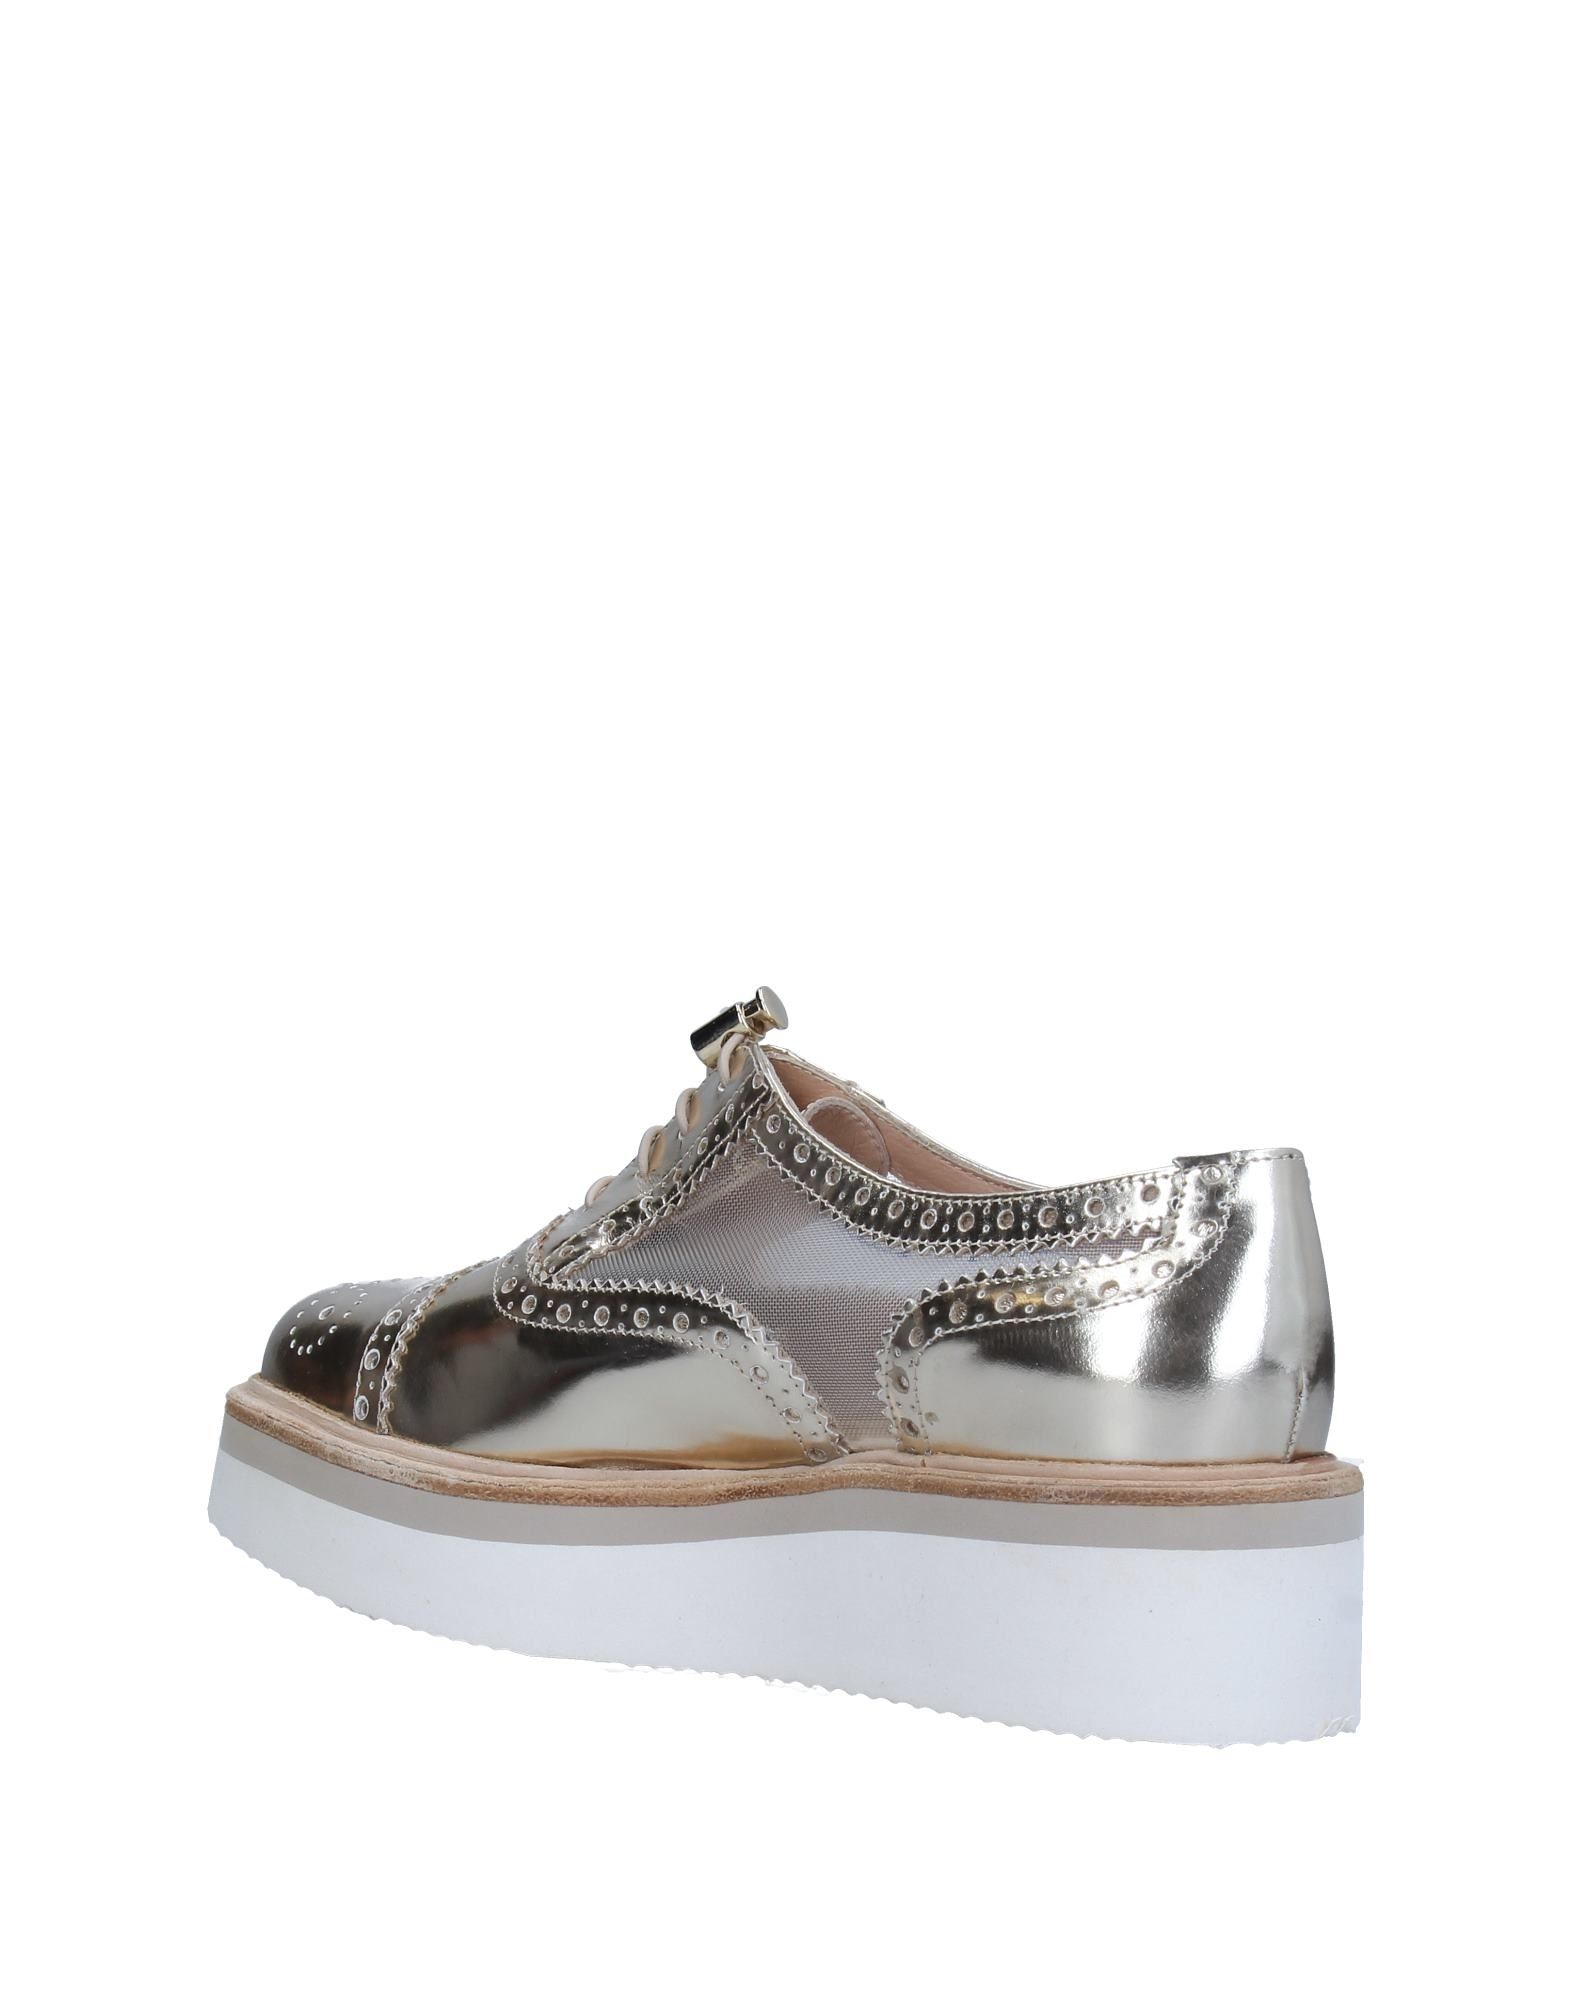 Gut um billige Schuhe zu tragenBaldinini 11330661RT Trend Schnürschuhe Damen  11330661RT tragenBaldinini bf4806